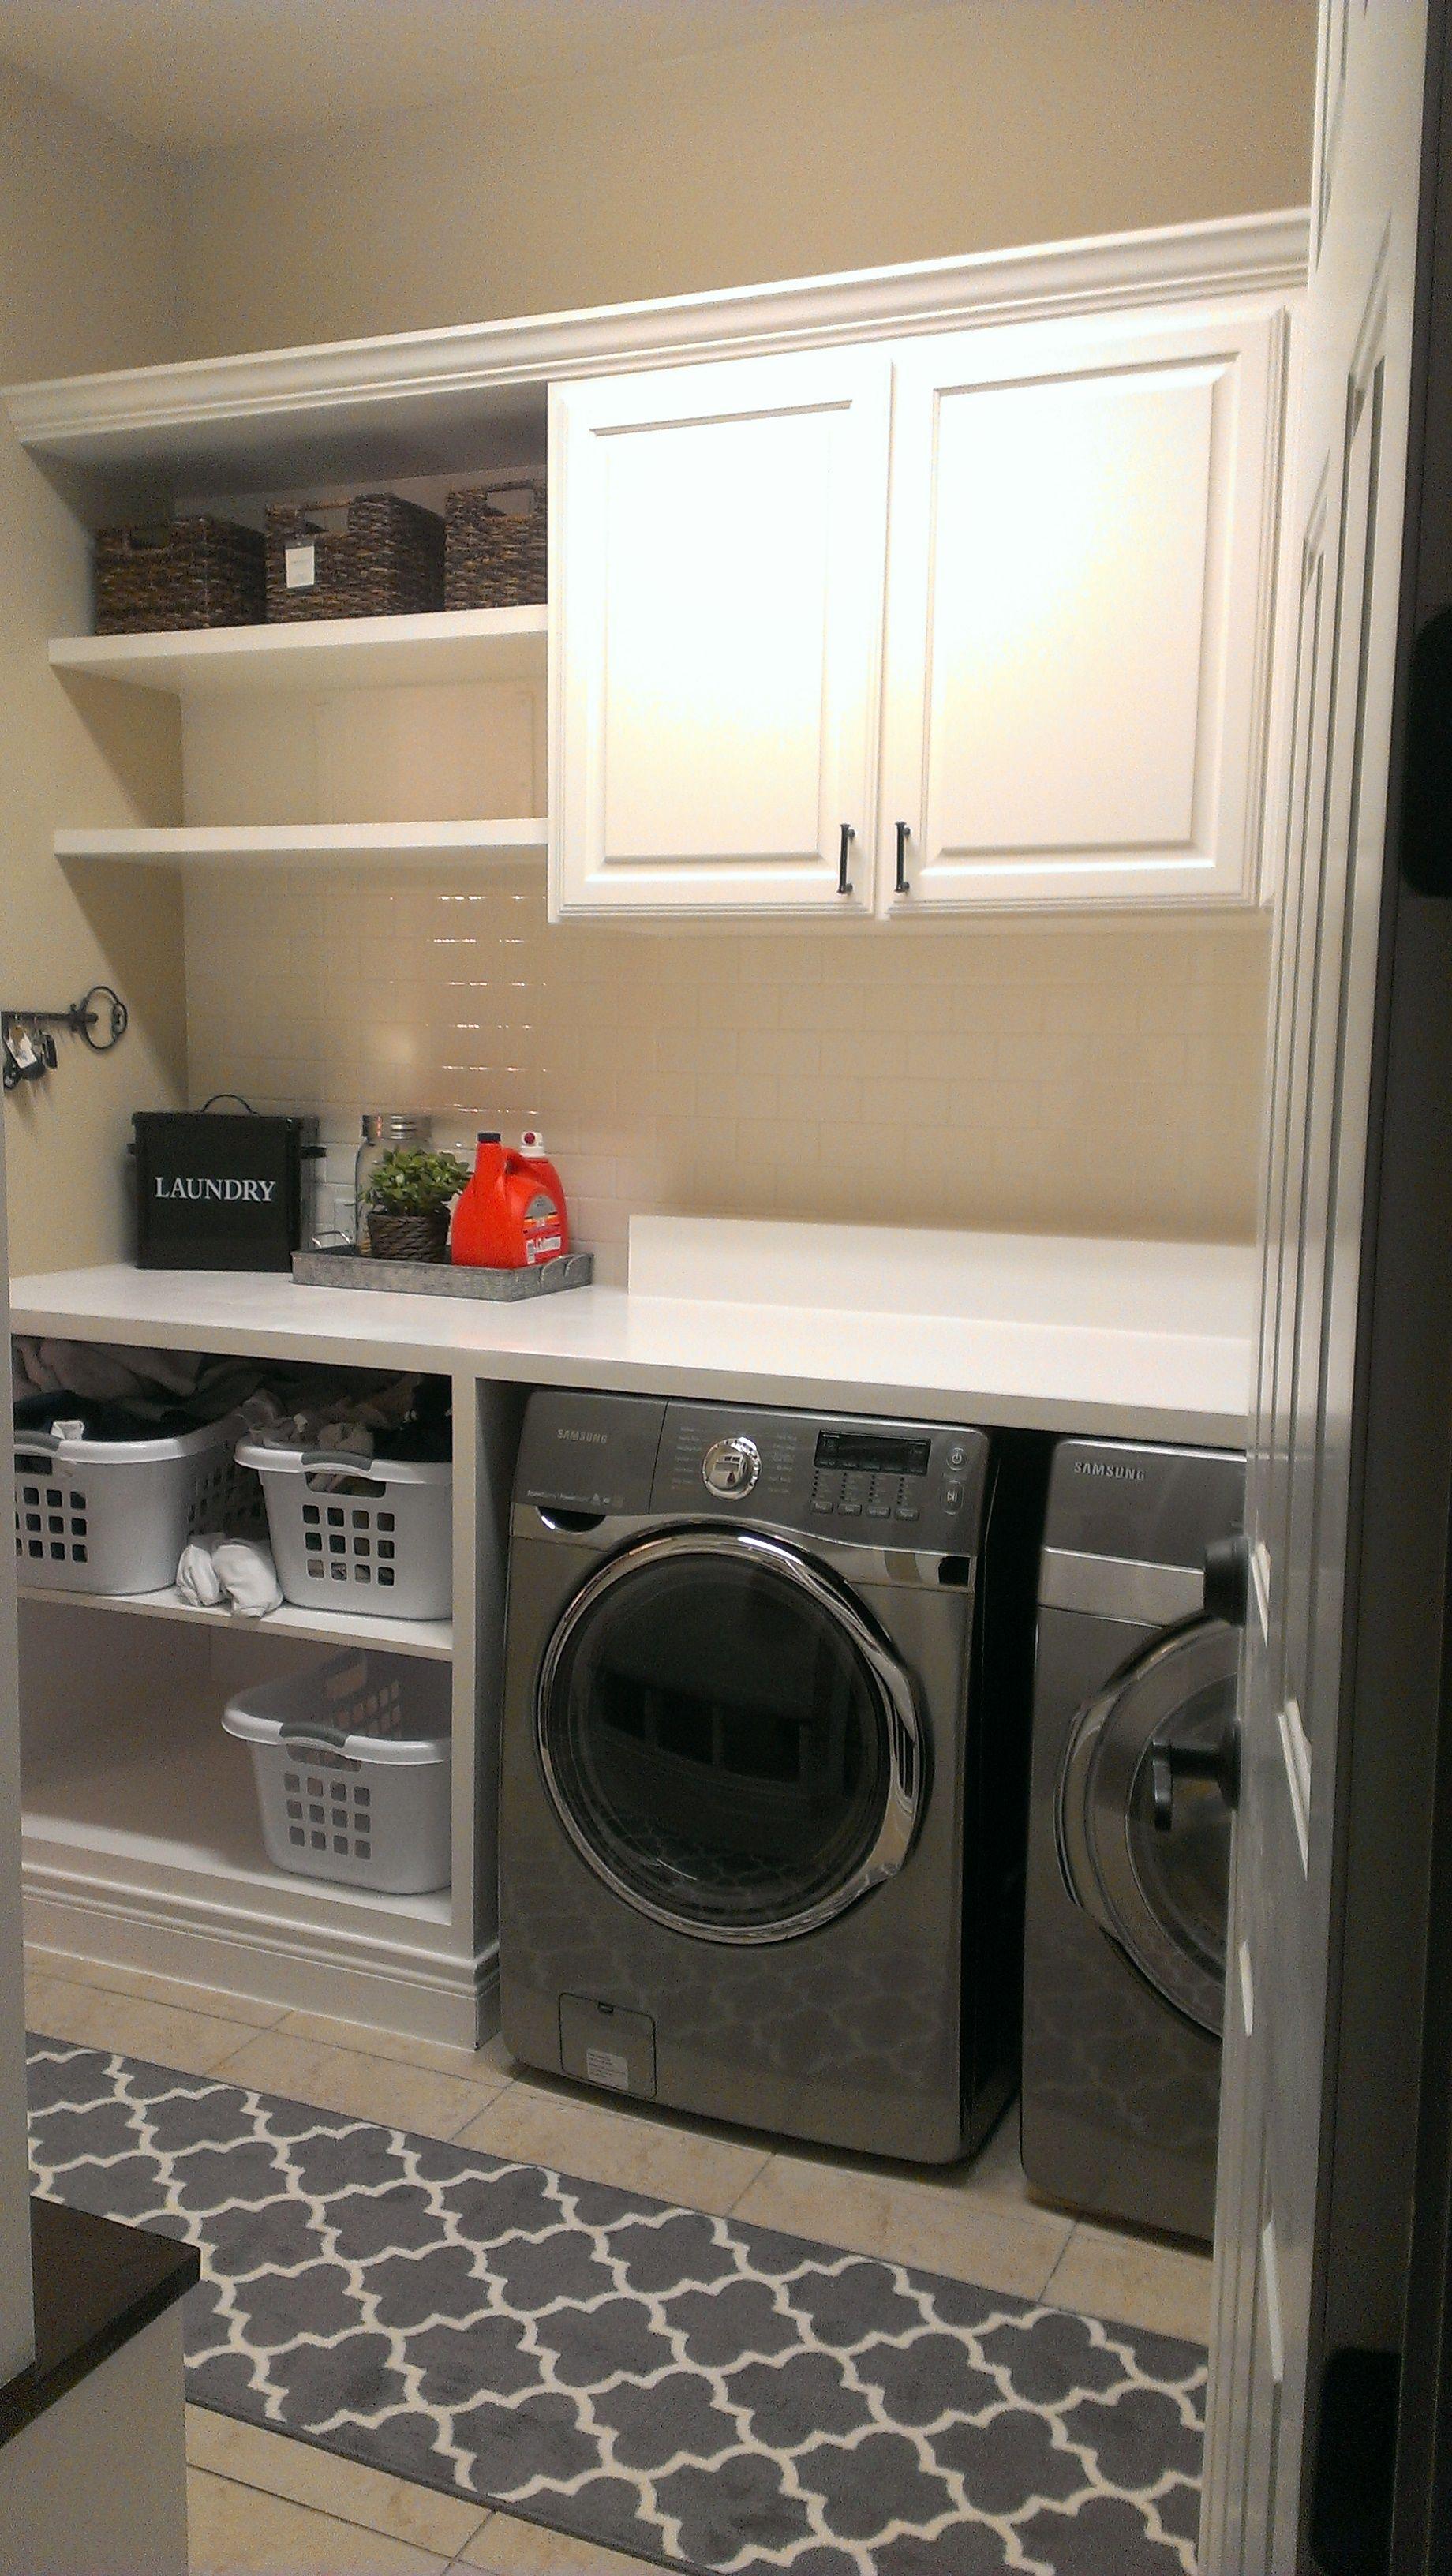 Minimalist Laundry Room Design Ceiling Ideas For Shop Pics Design Inspiration Interior Design